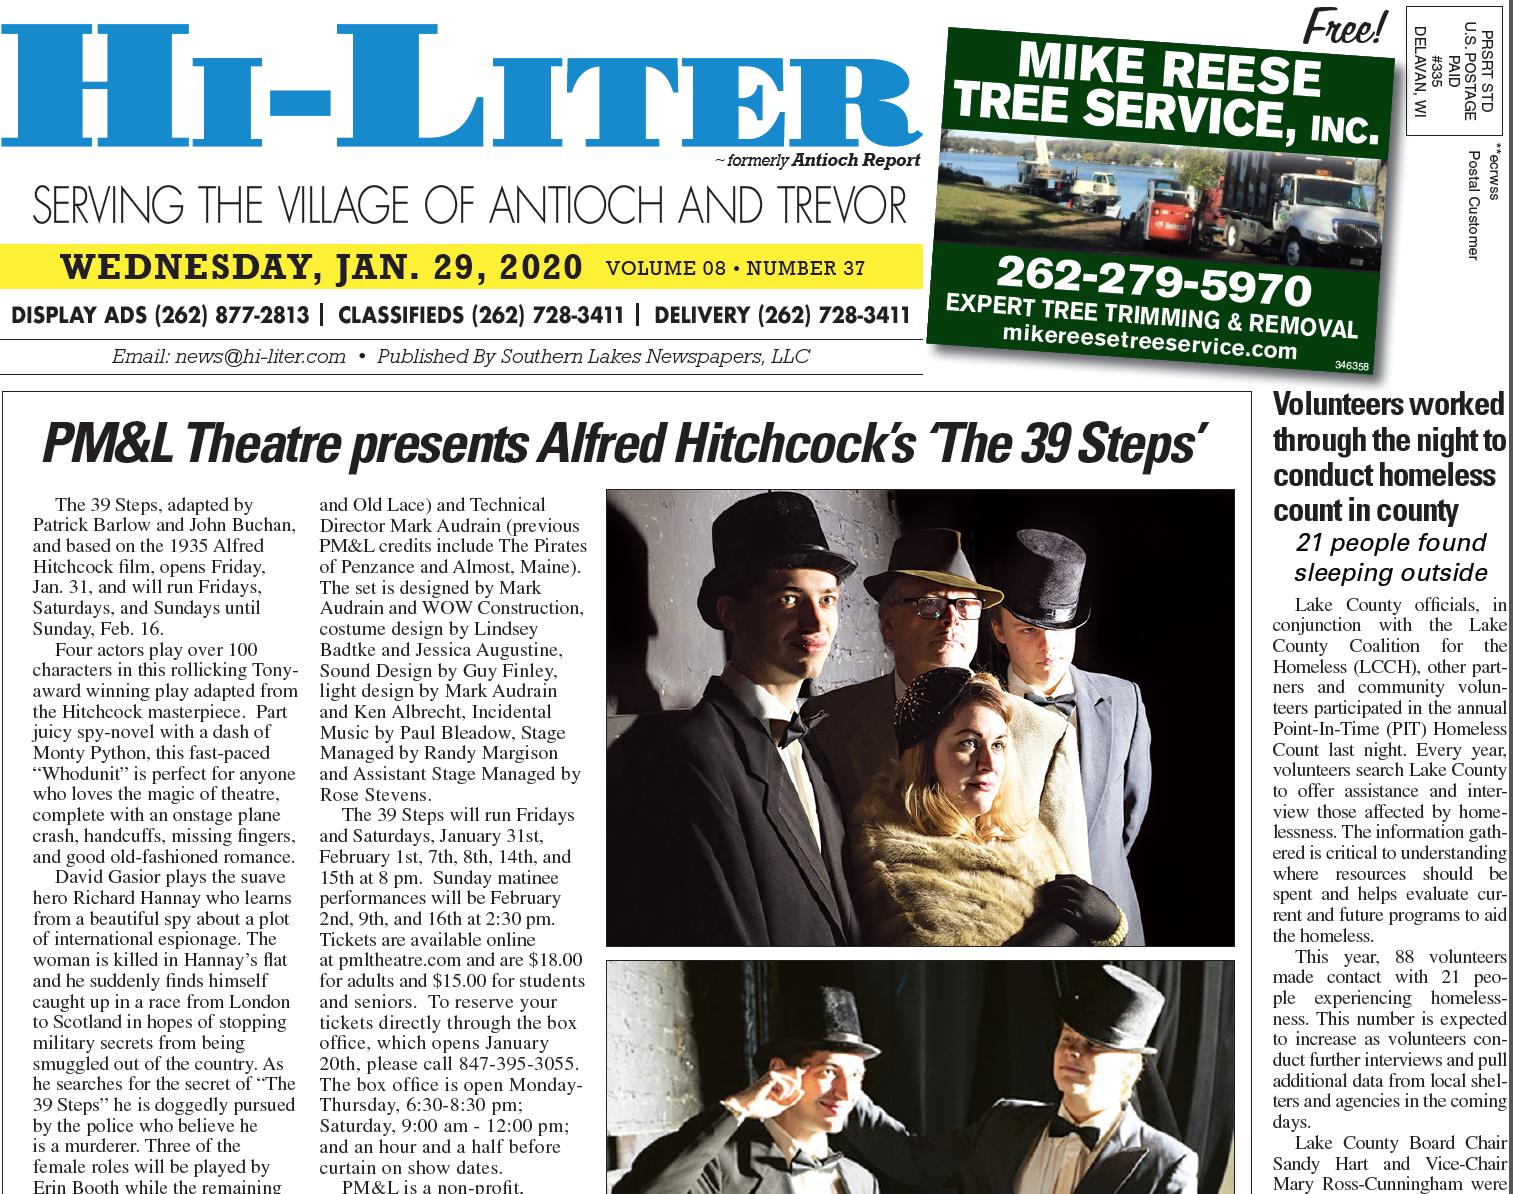 Illinois Hiliter for 1/29/20